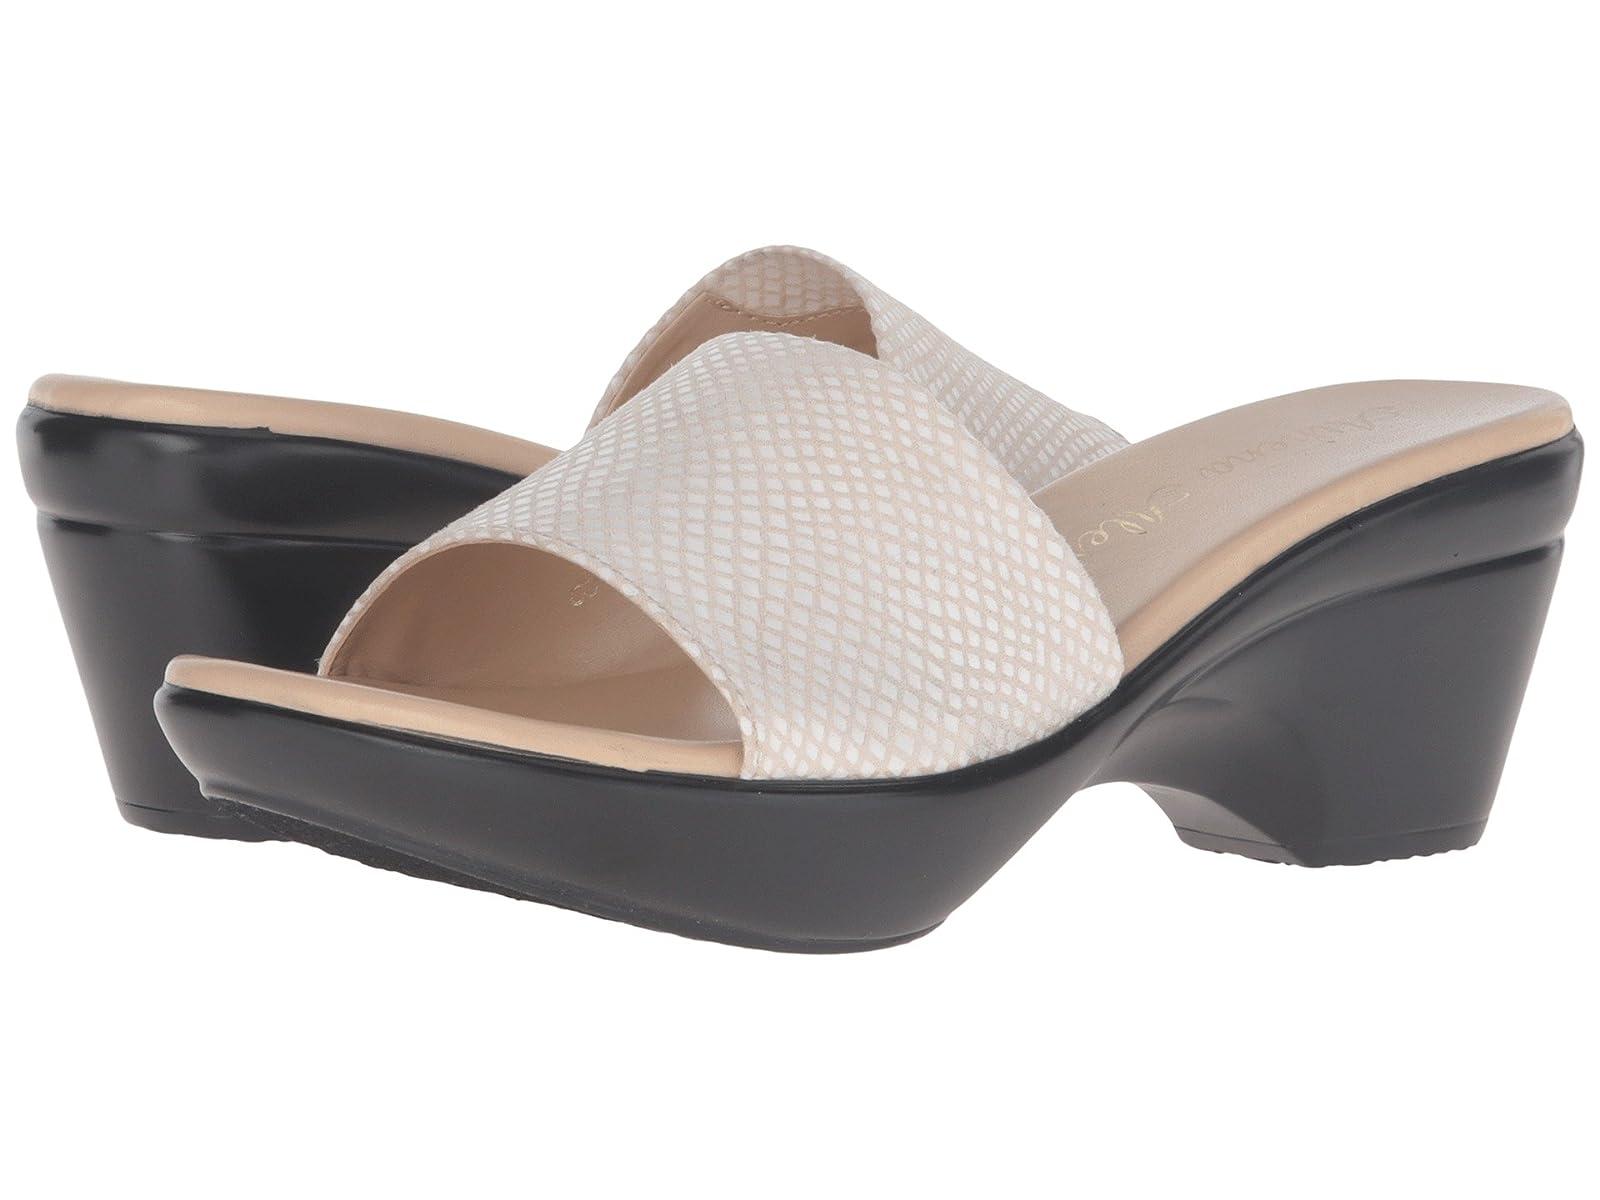 Athena Alexander LorieCheap and distinctive eye-catching shoes